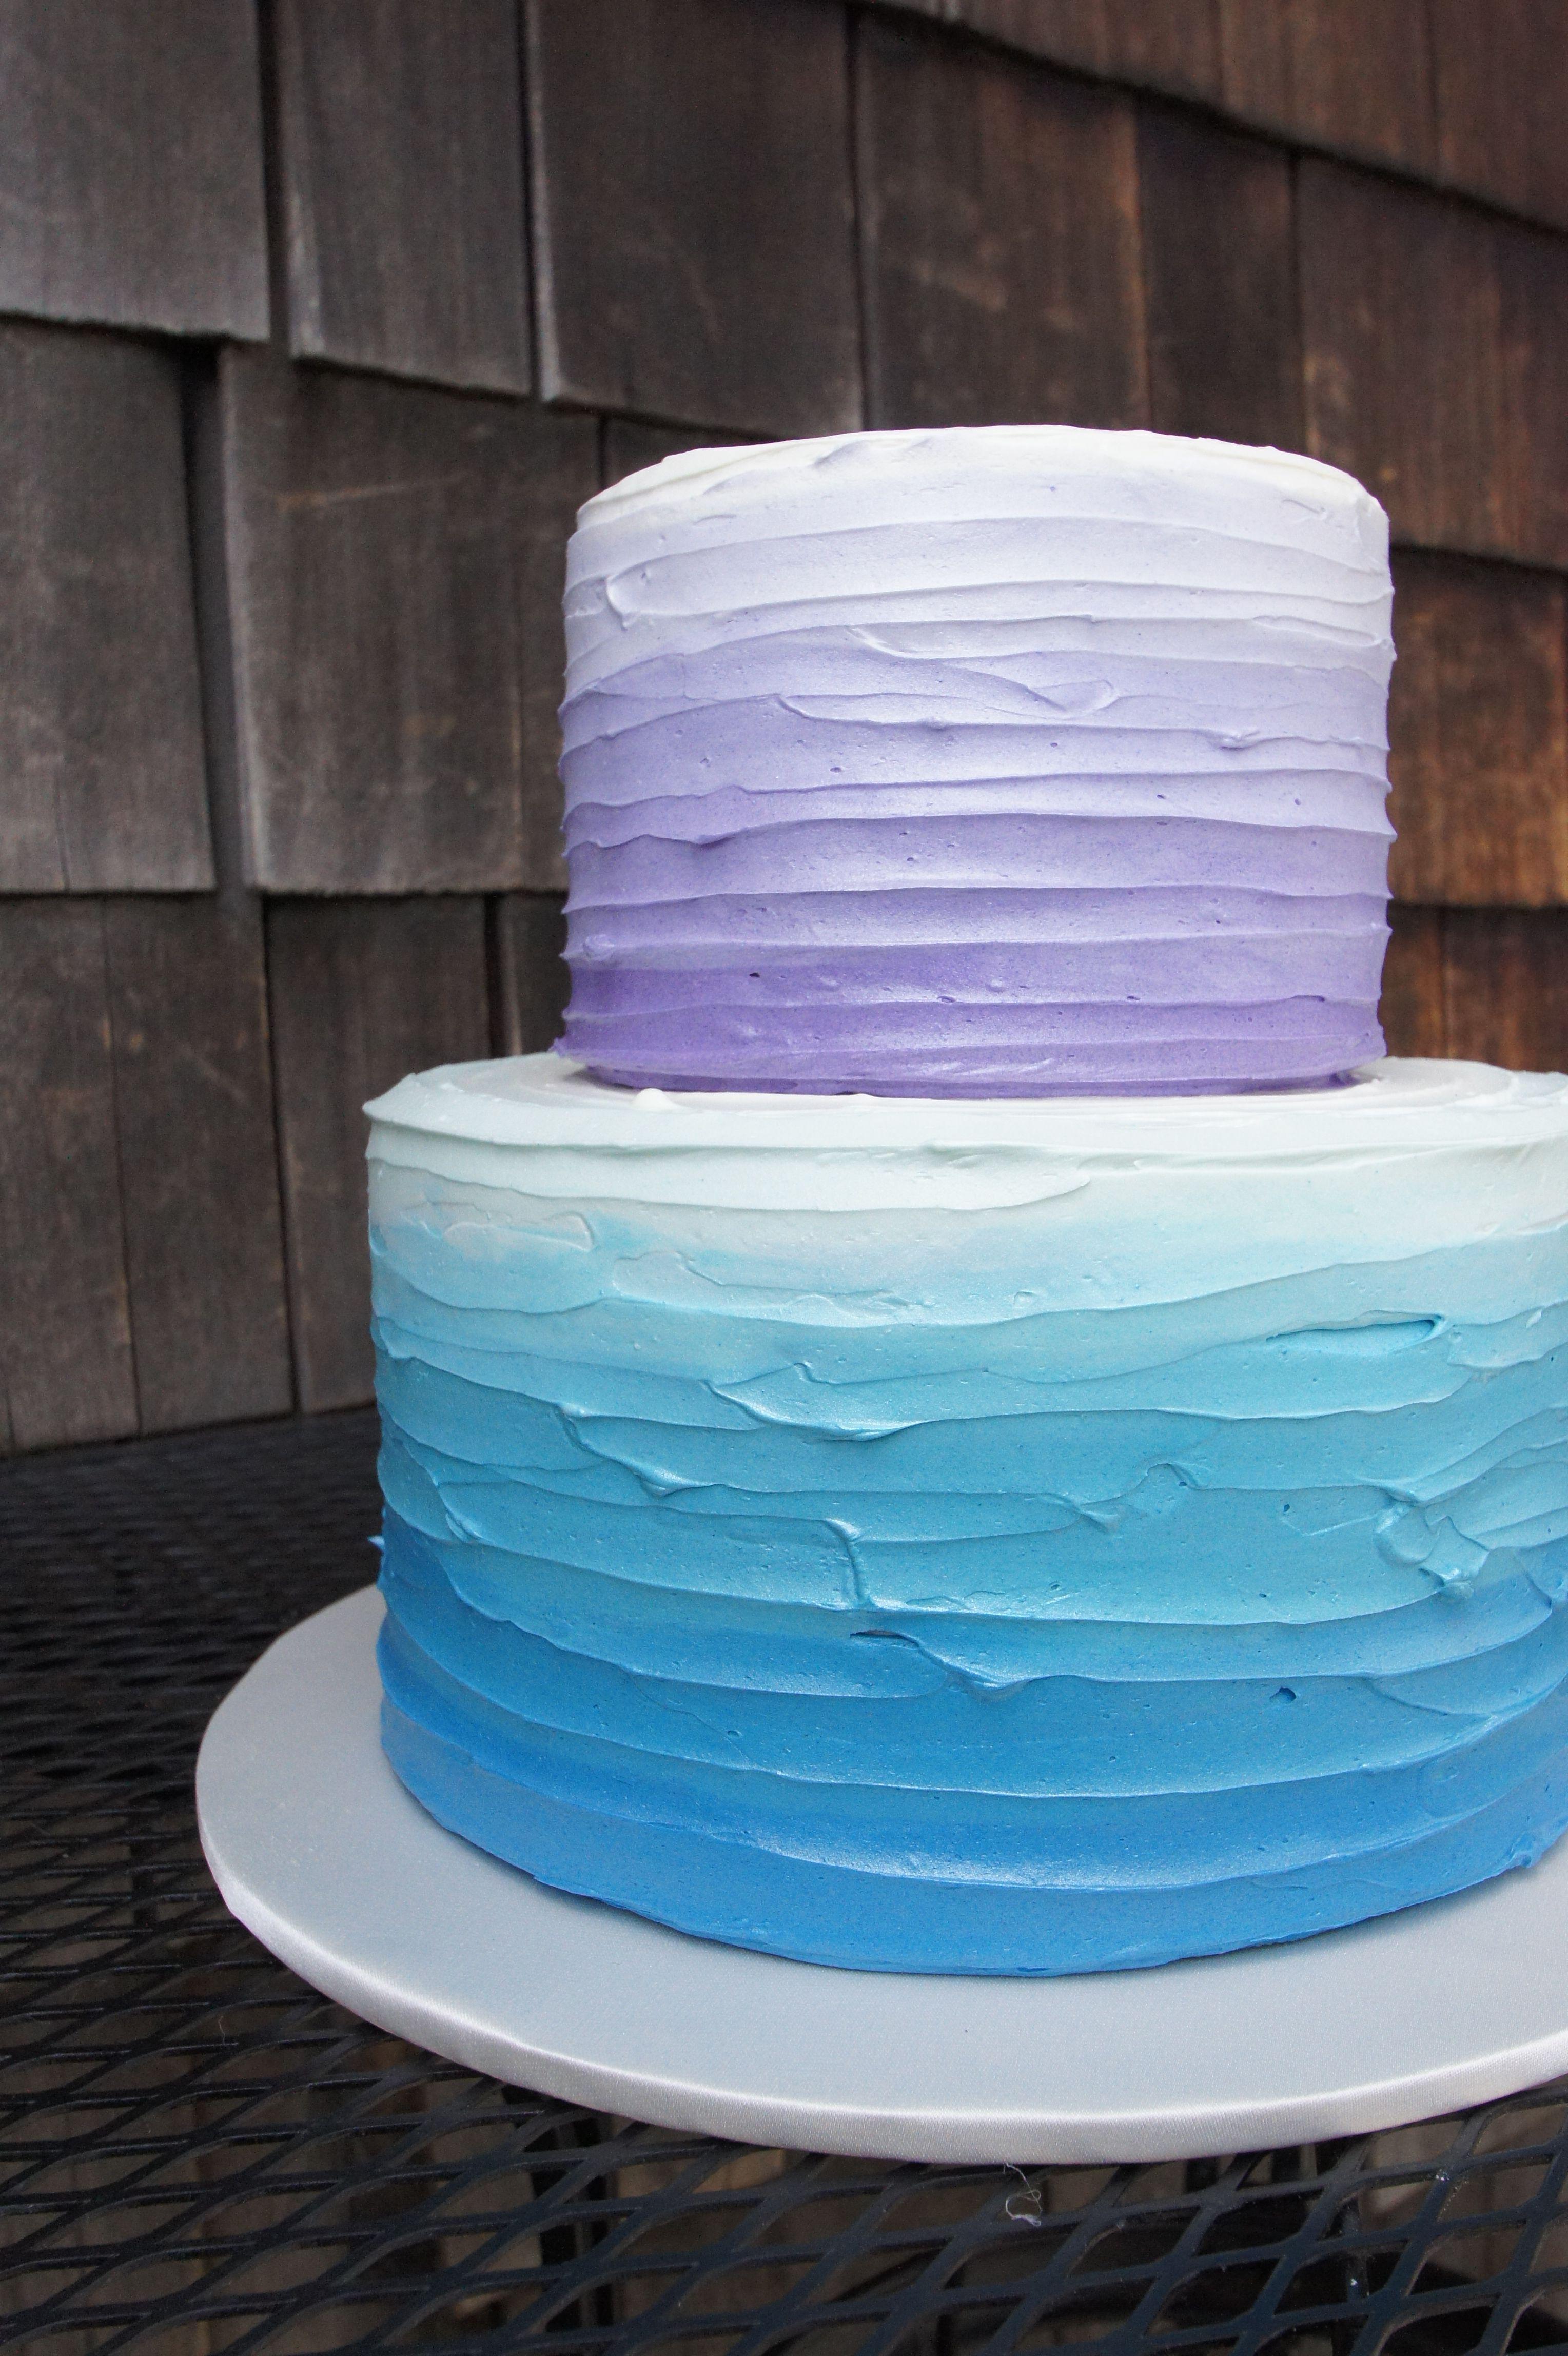 Purple icing texture photo